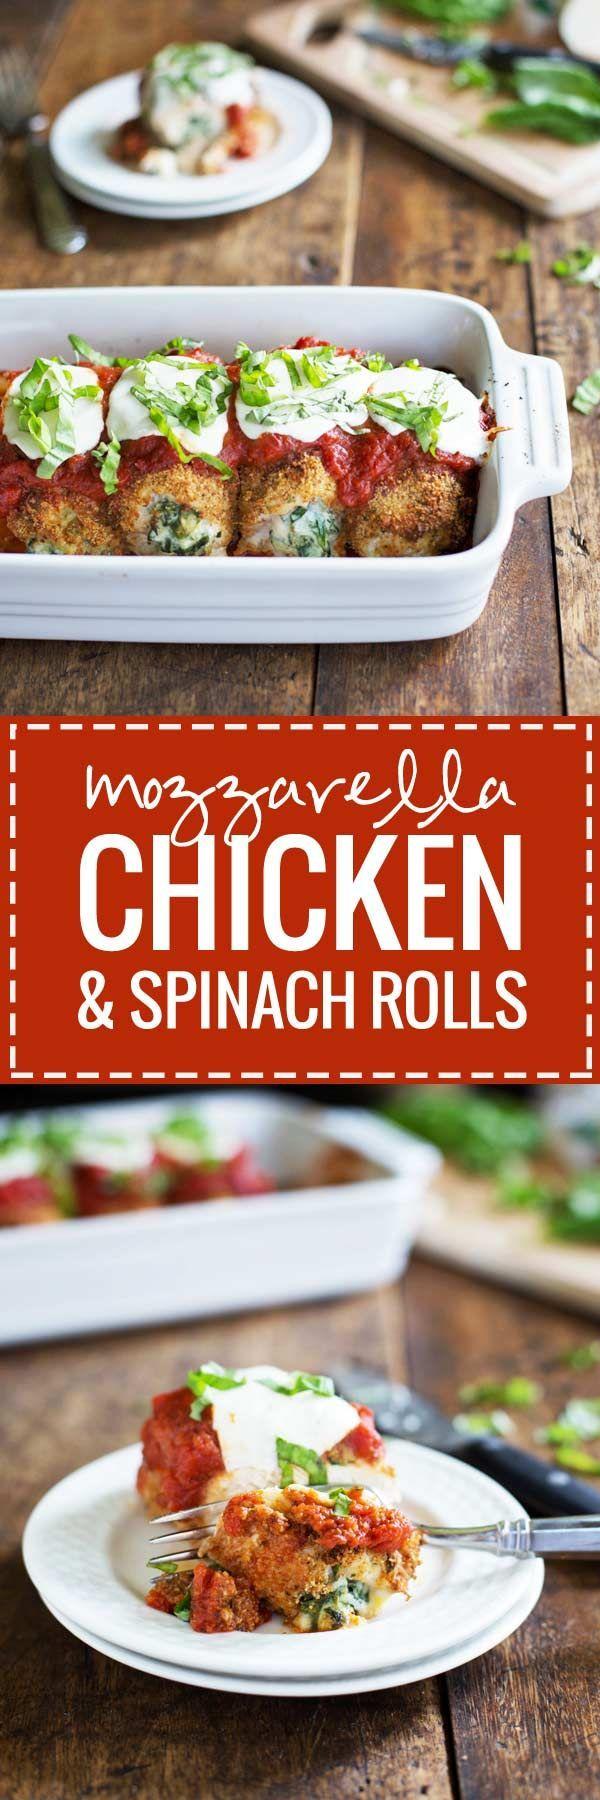 Baked Mozzarella and Chicken Spinach Rolls | pinchofyum.com #foodrecipe